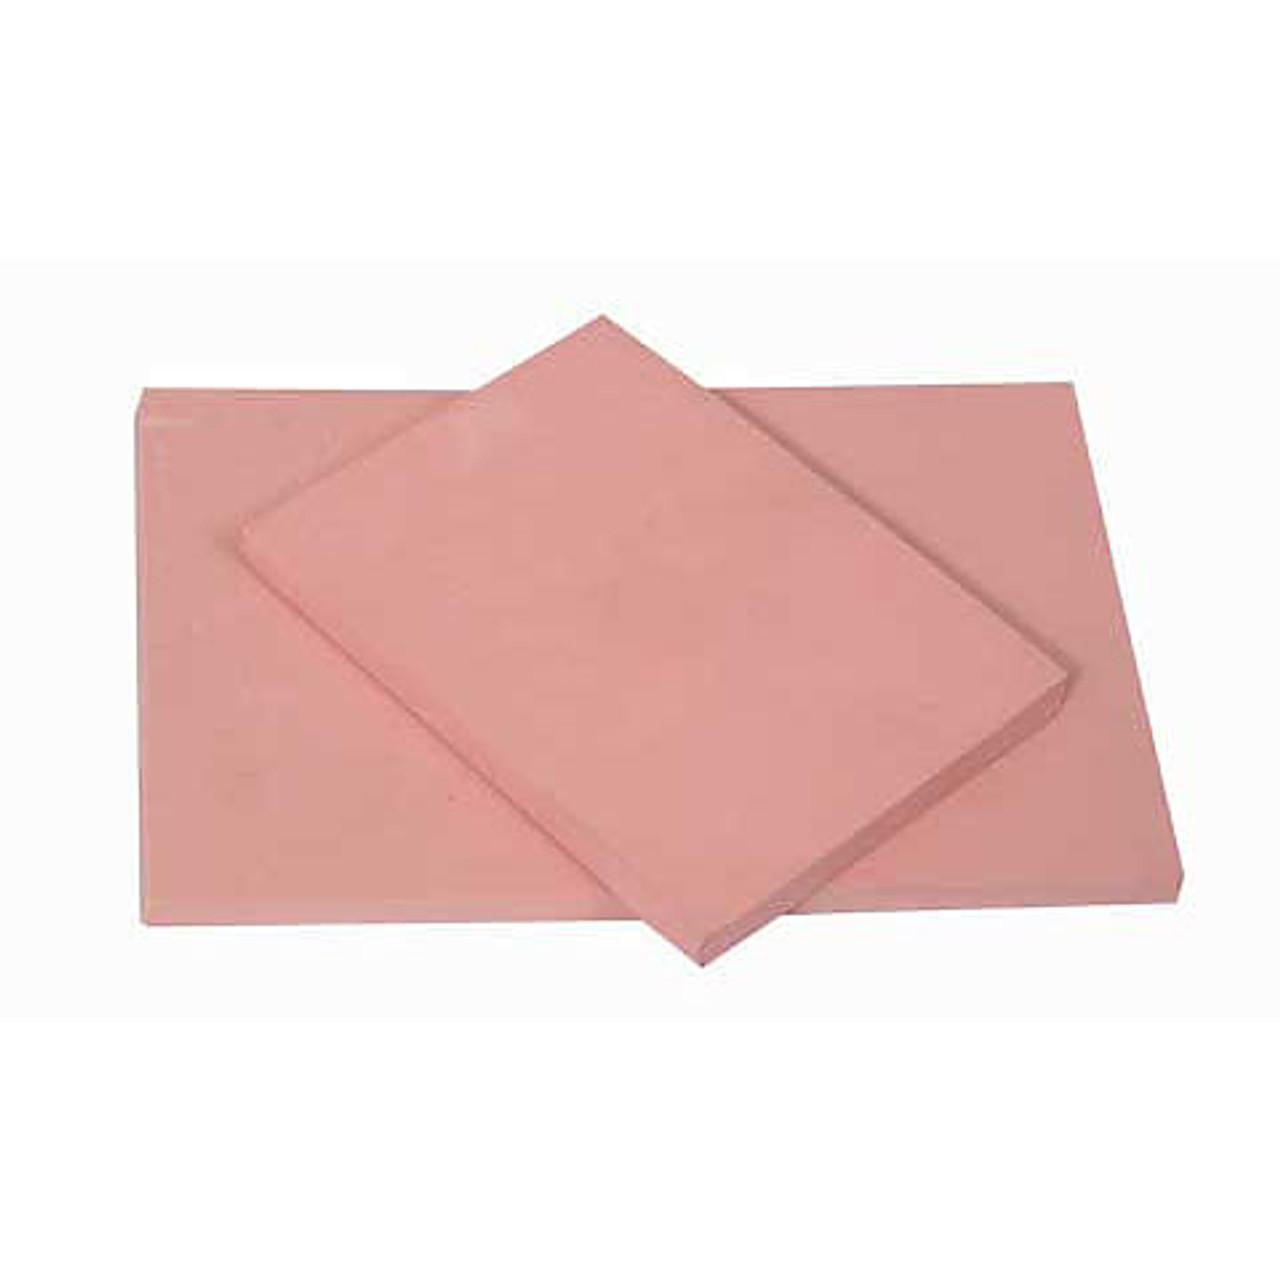 Speedy-Carve Pink Blocks